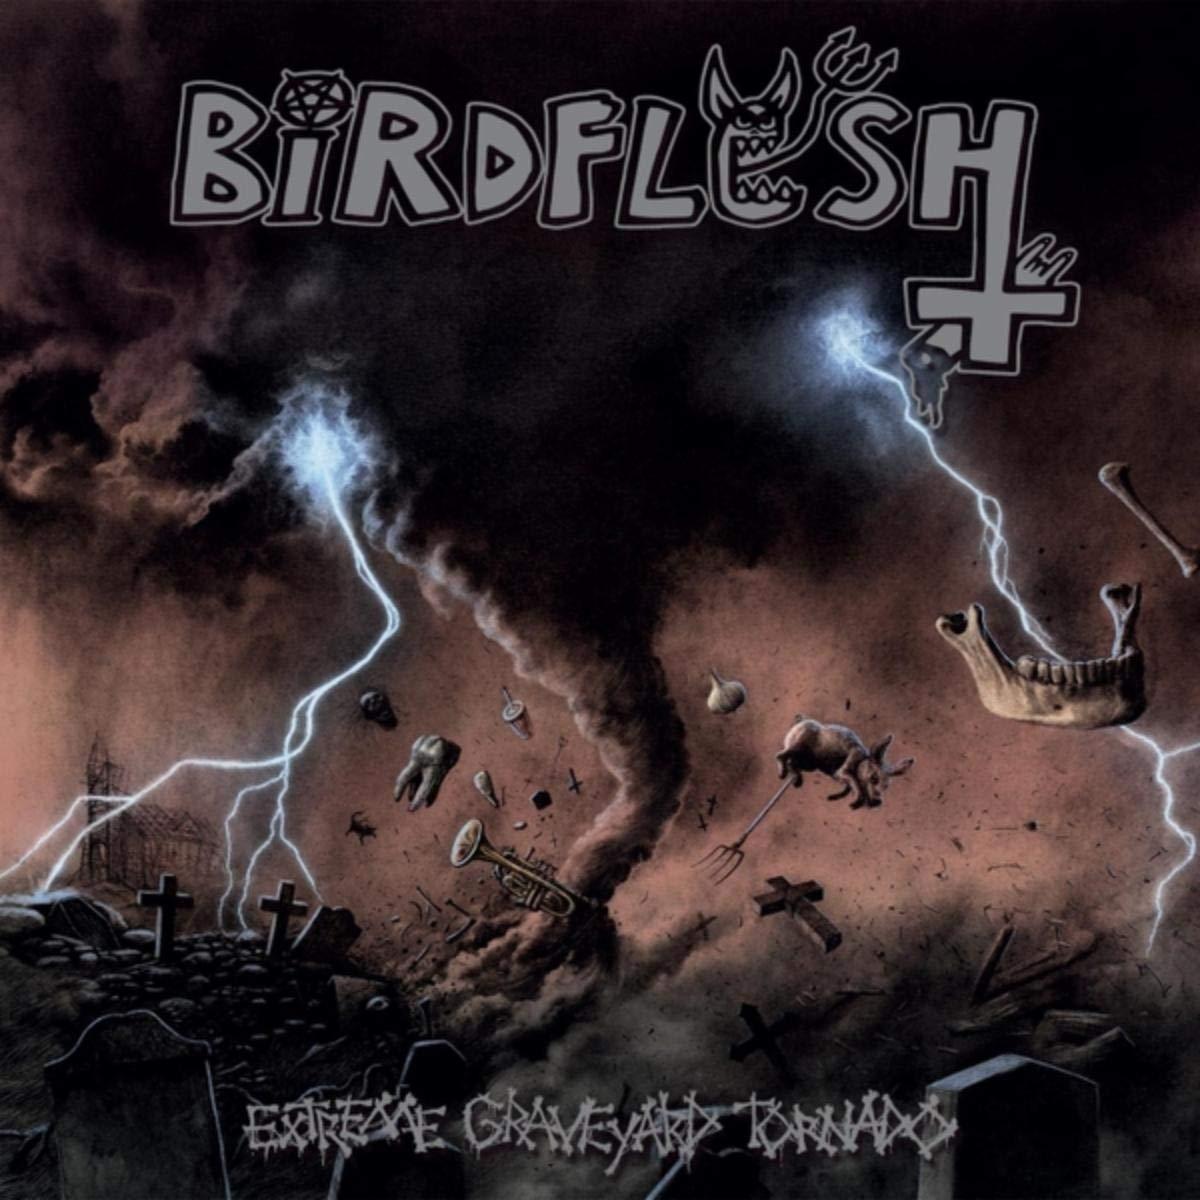 Birdflesh – Extreme Graveyard Tornado (2019) [FLAC]